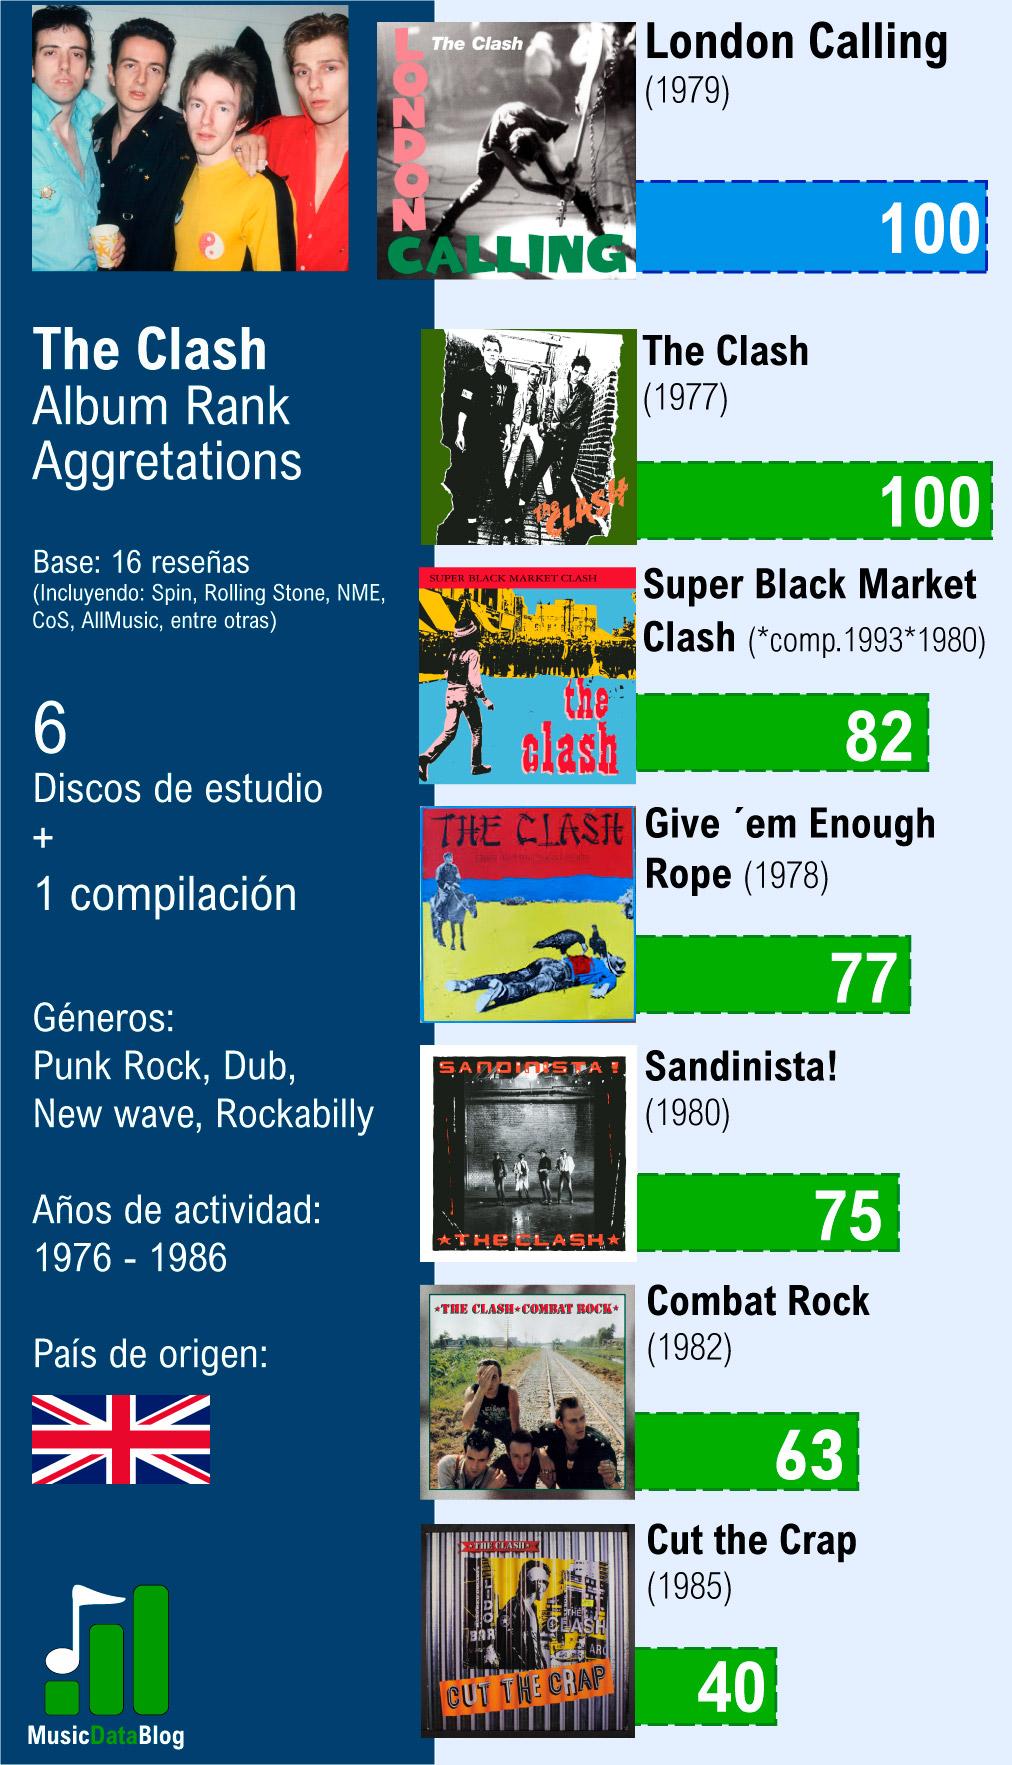 discografia the clash rankeada